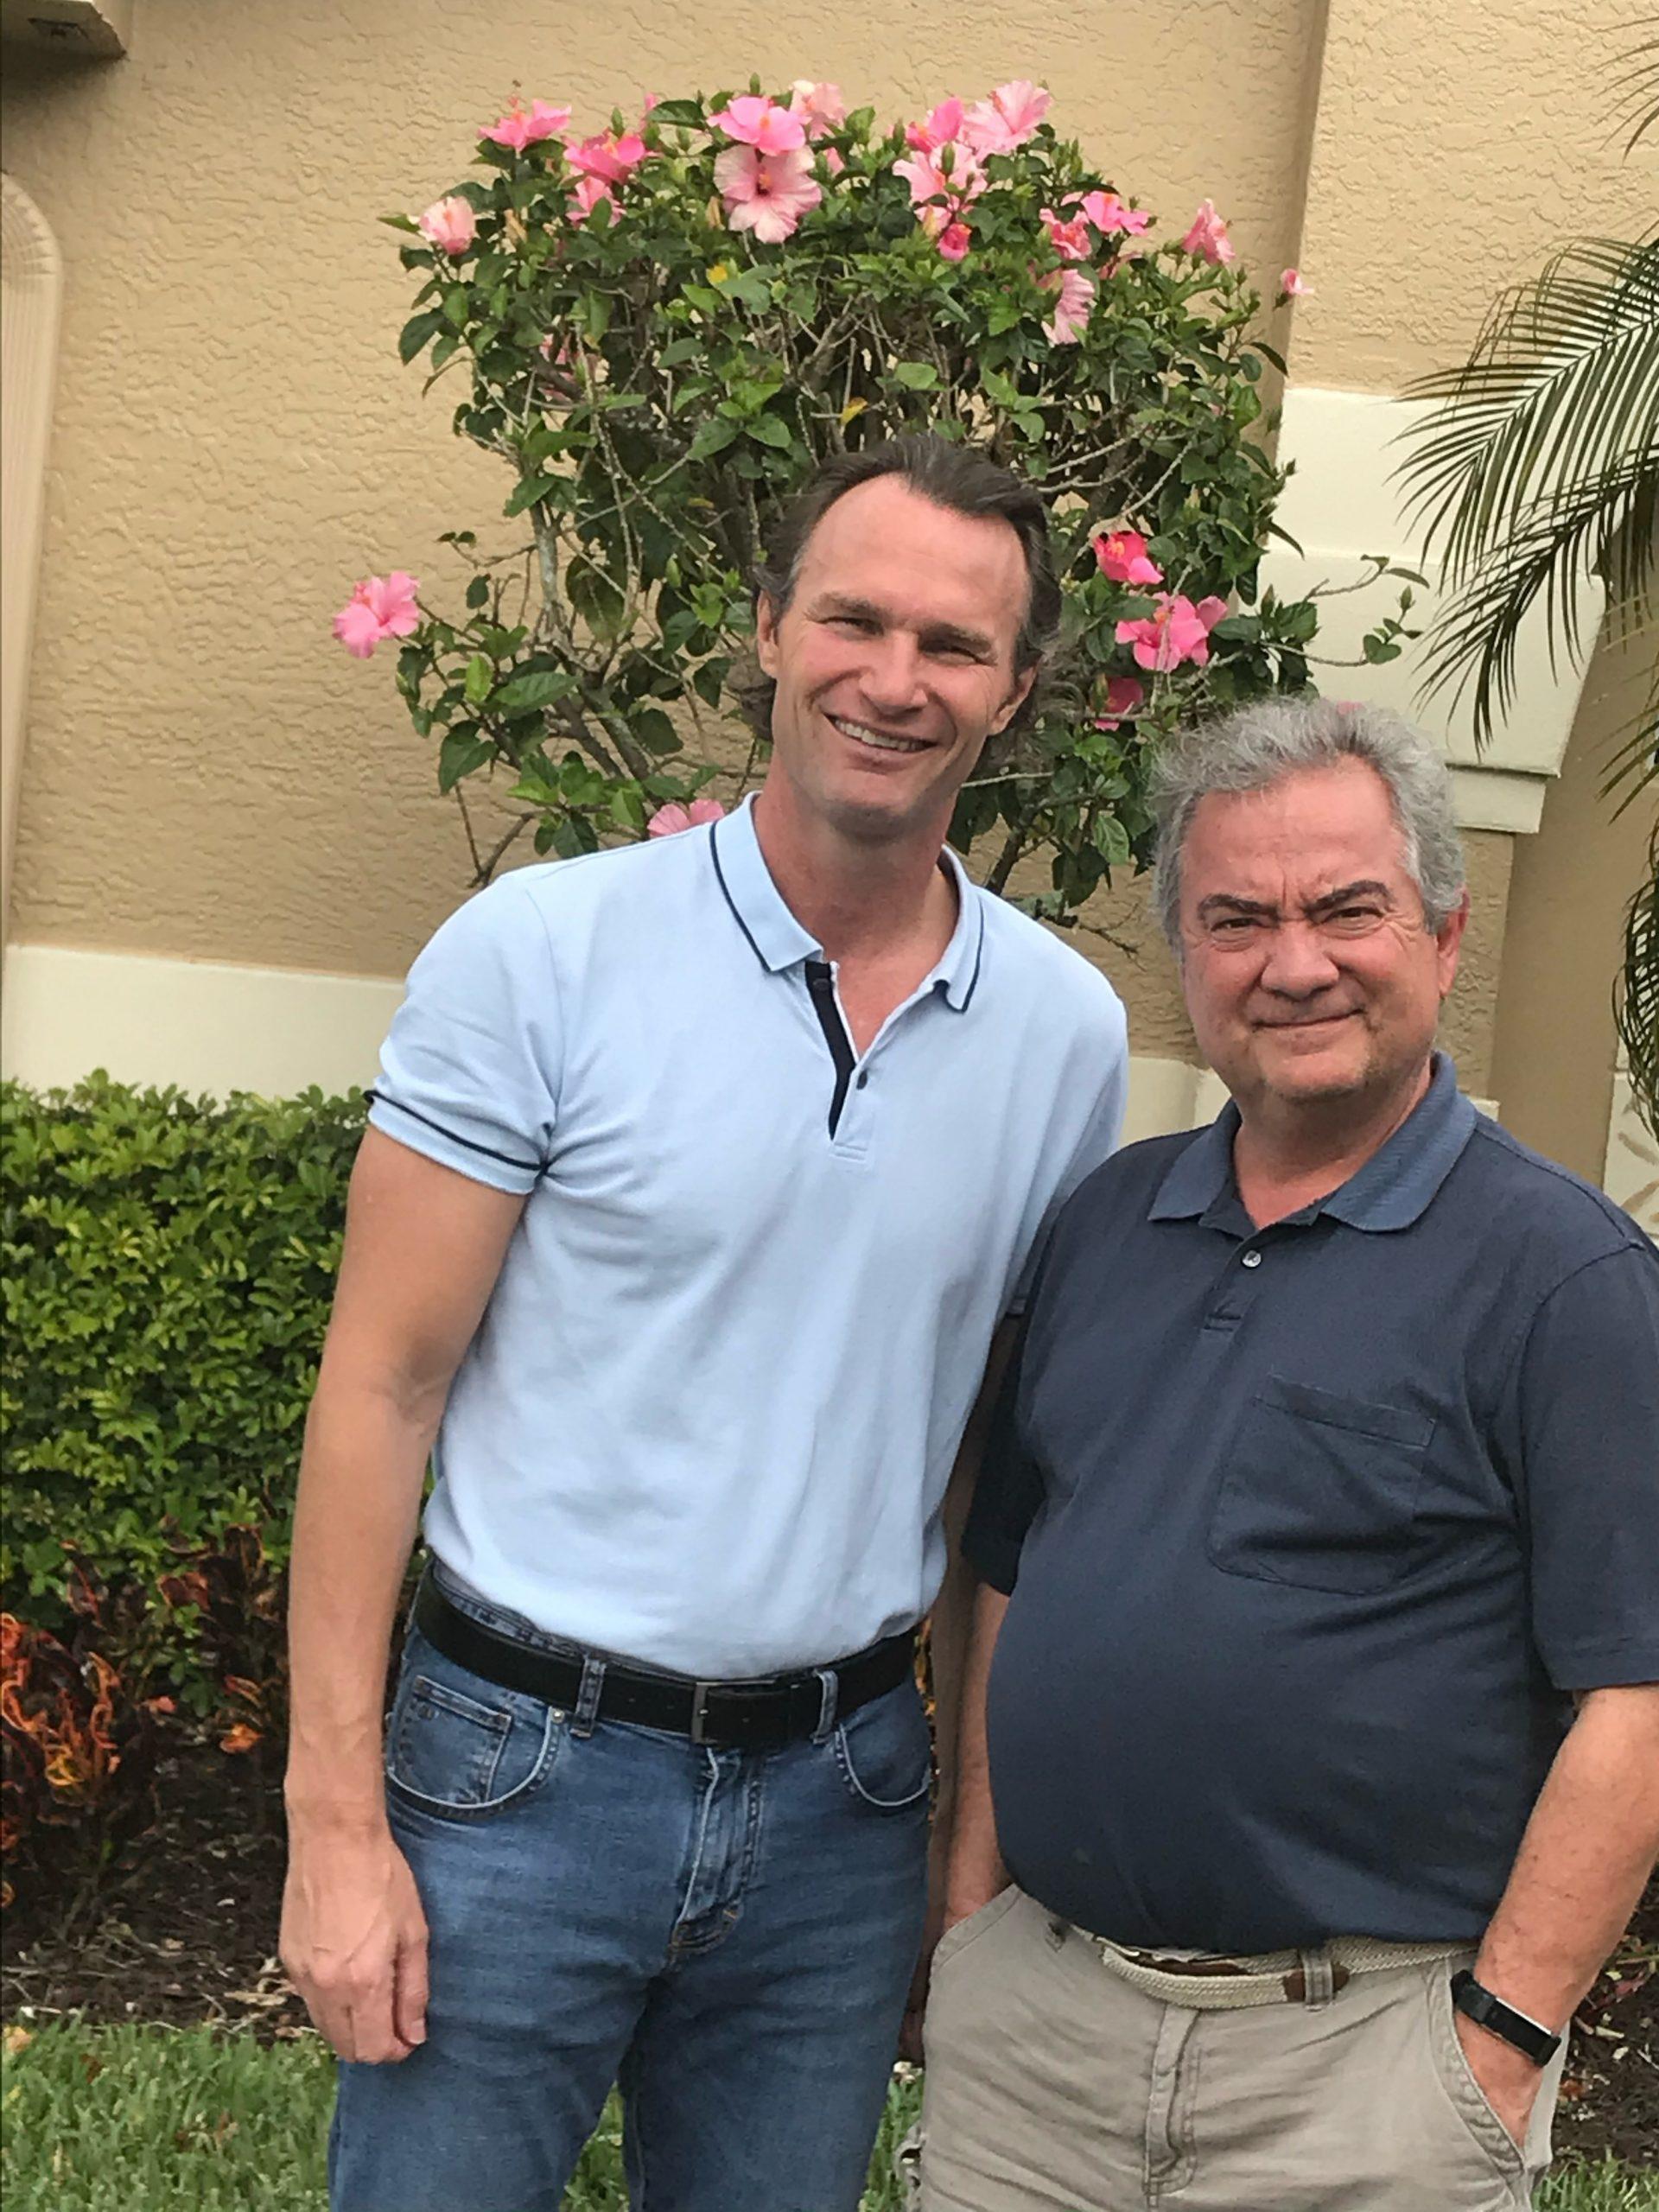 Greg Poss and Craig Handel